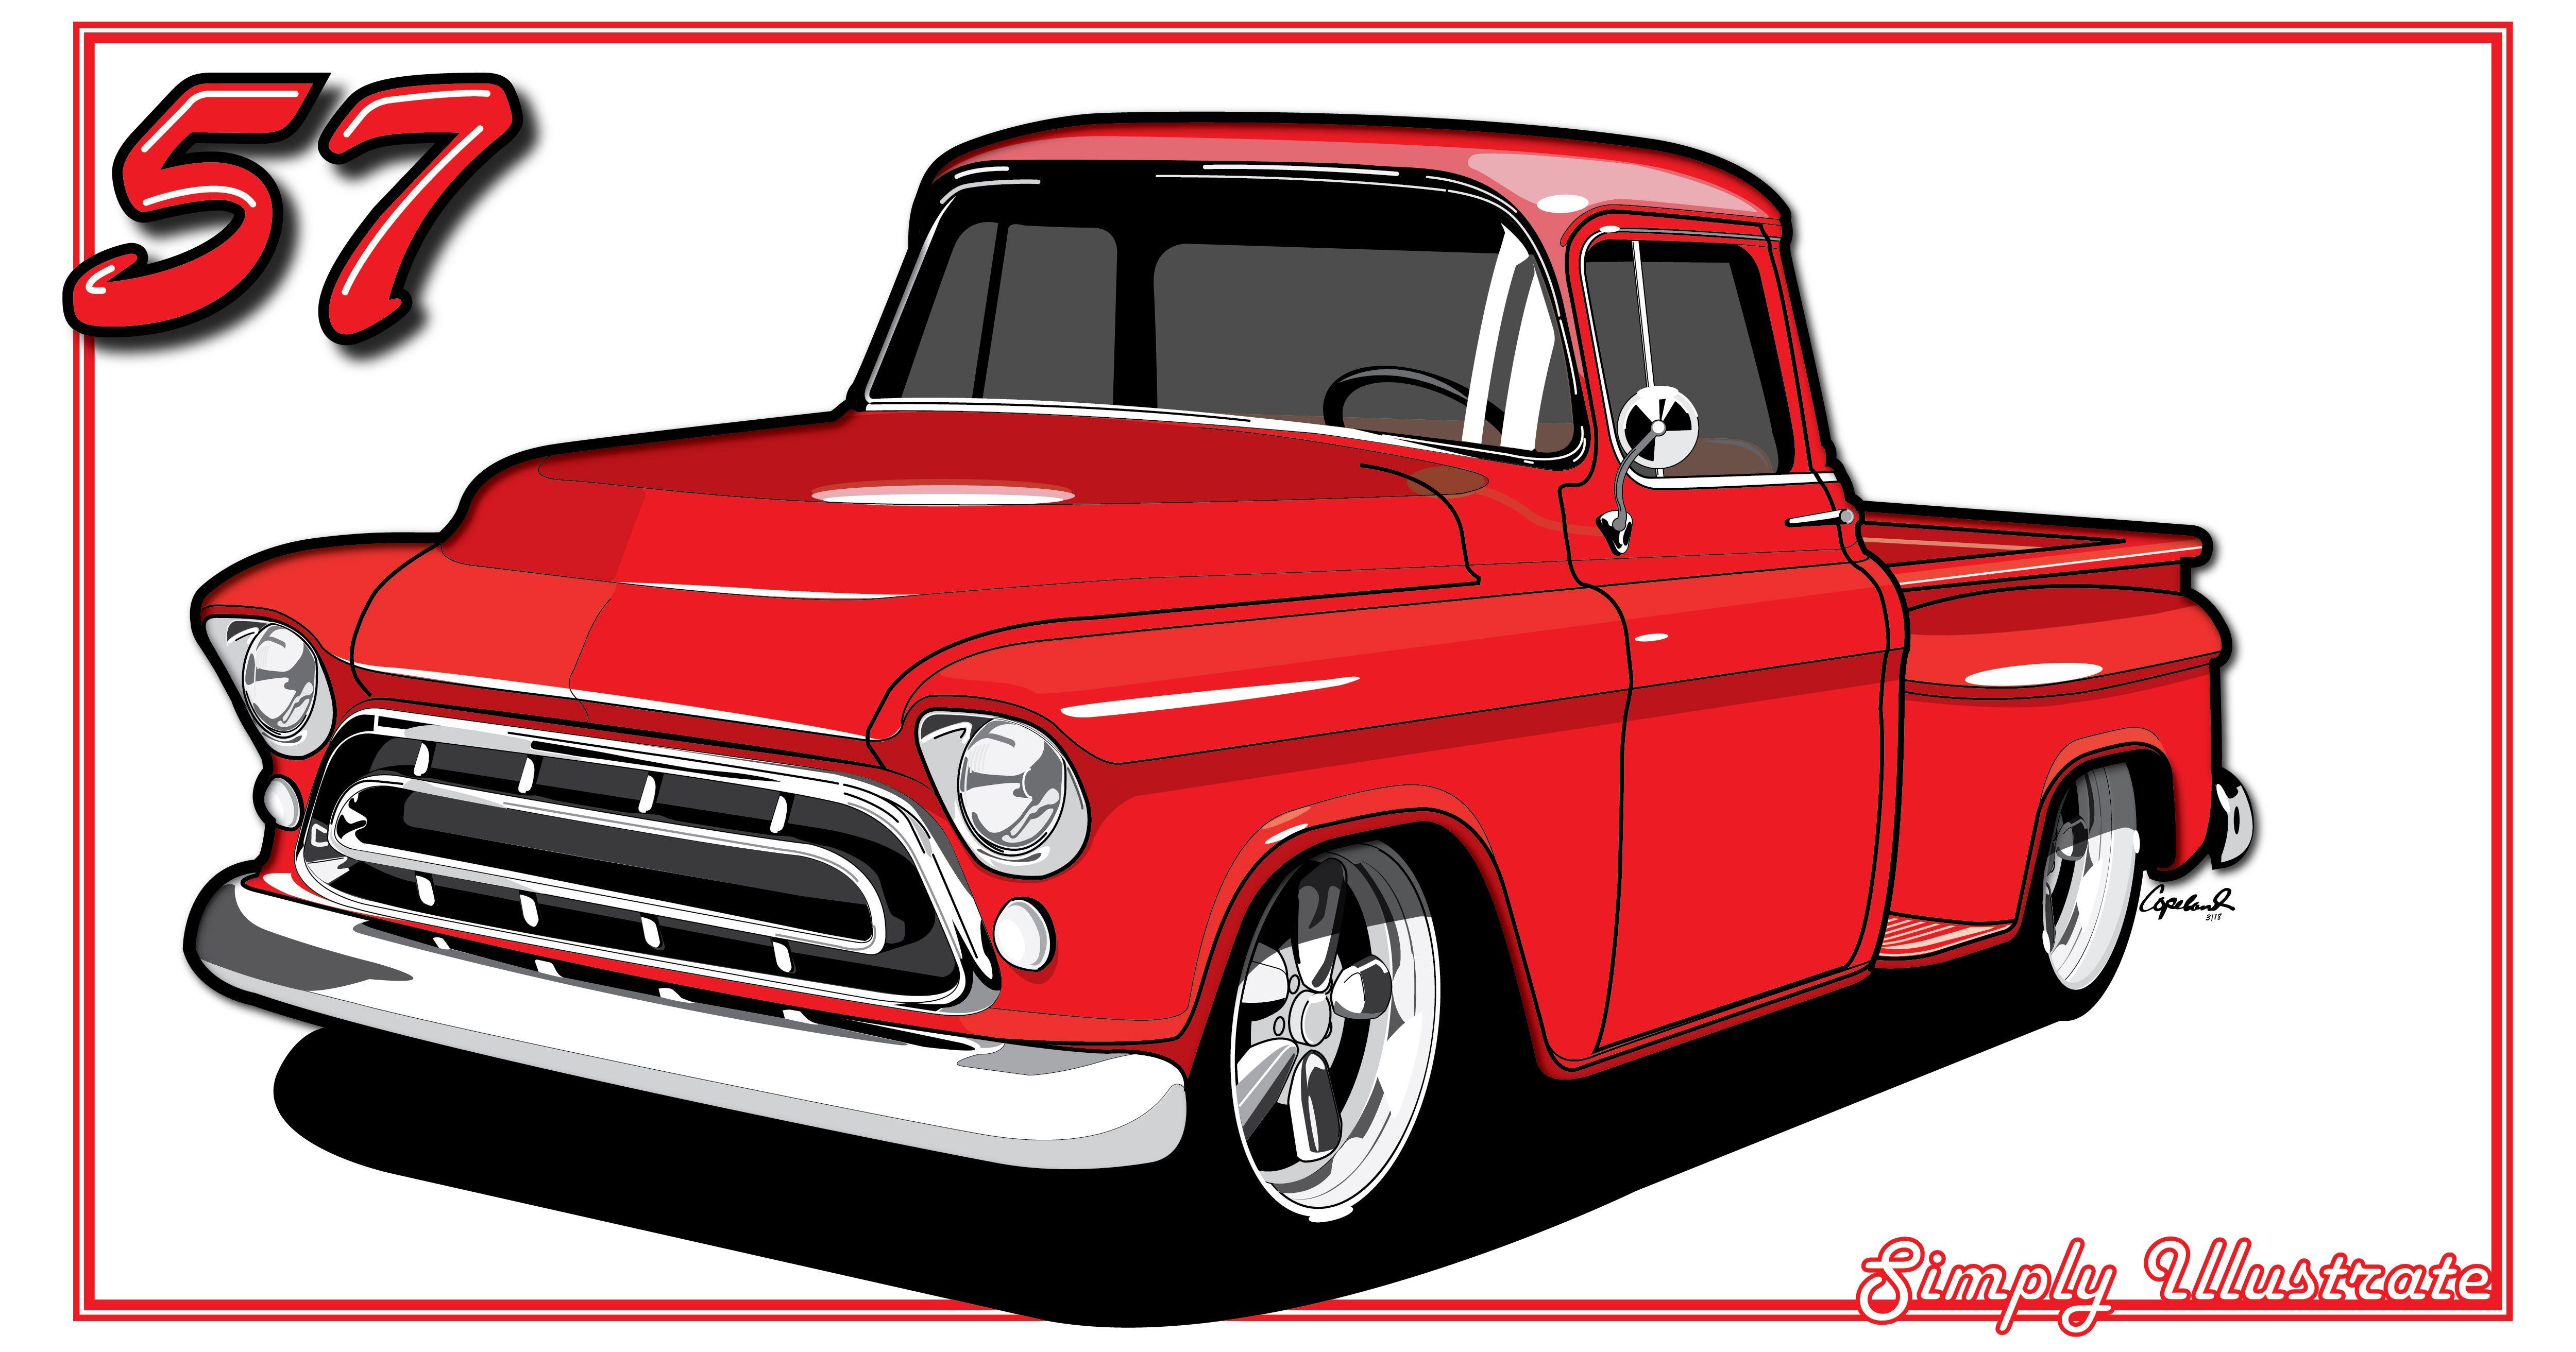 5000x2625 Chevy Truck Simply Illustrate Chevy Trucks, Trucks, Chevy